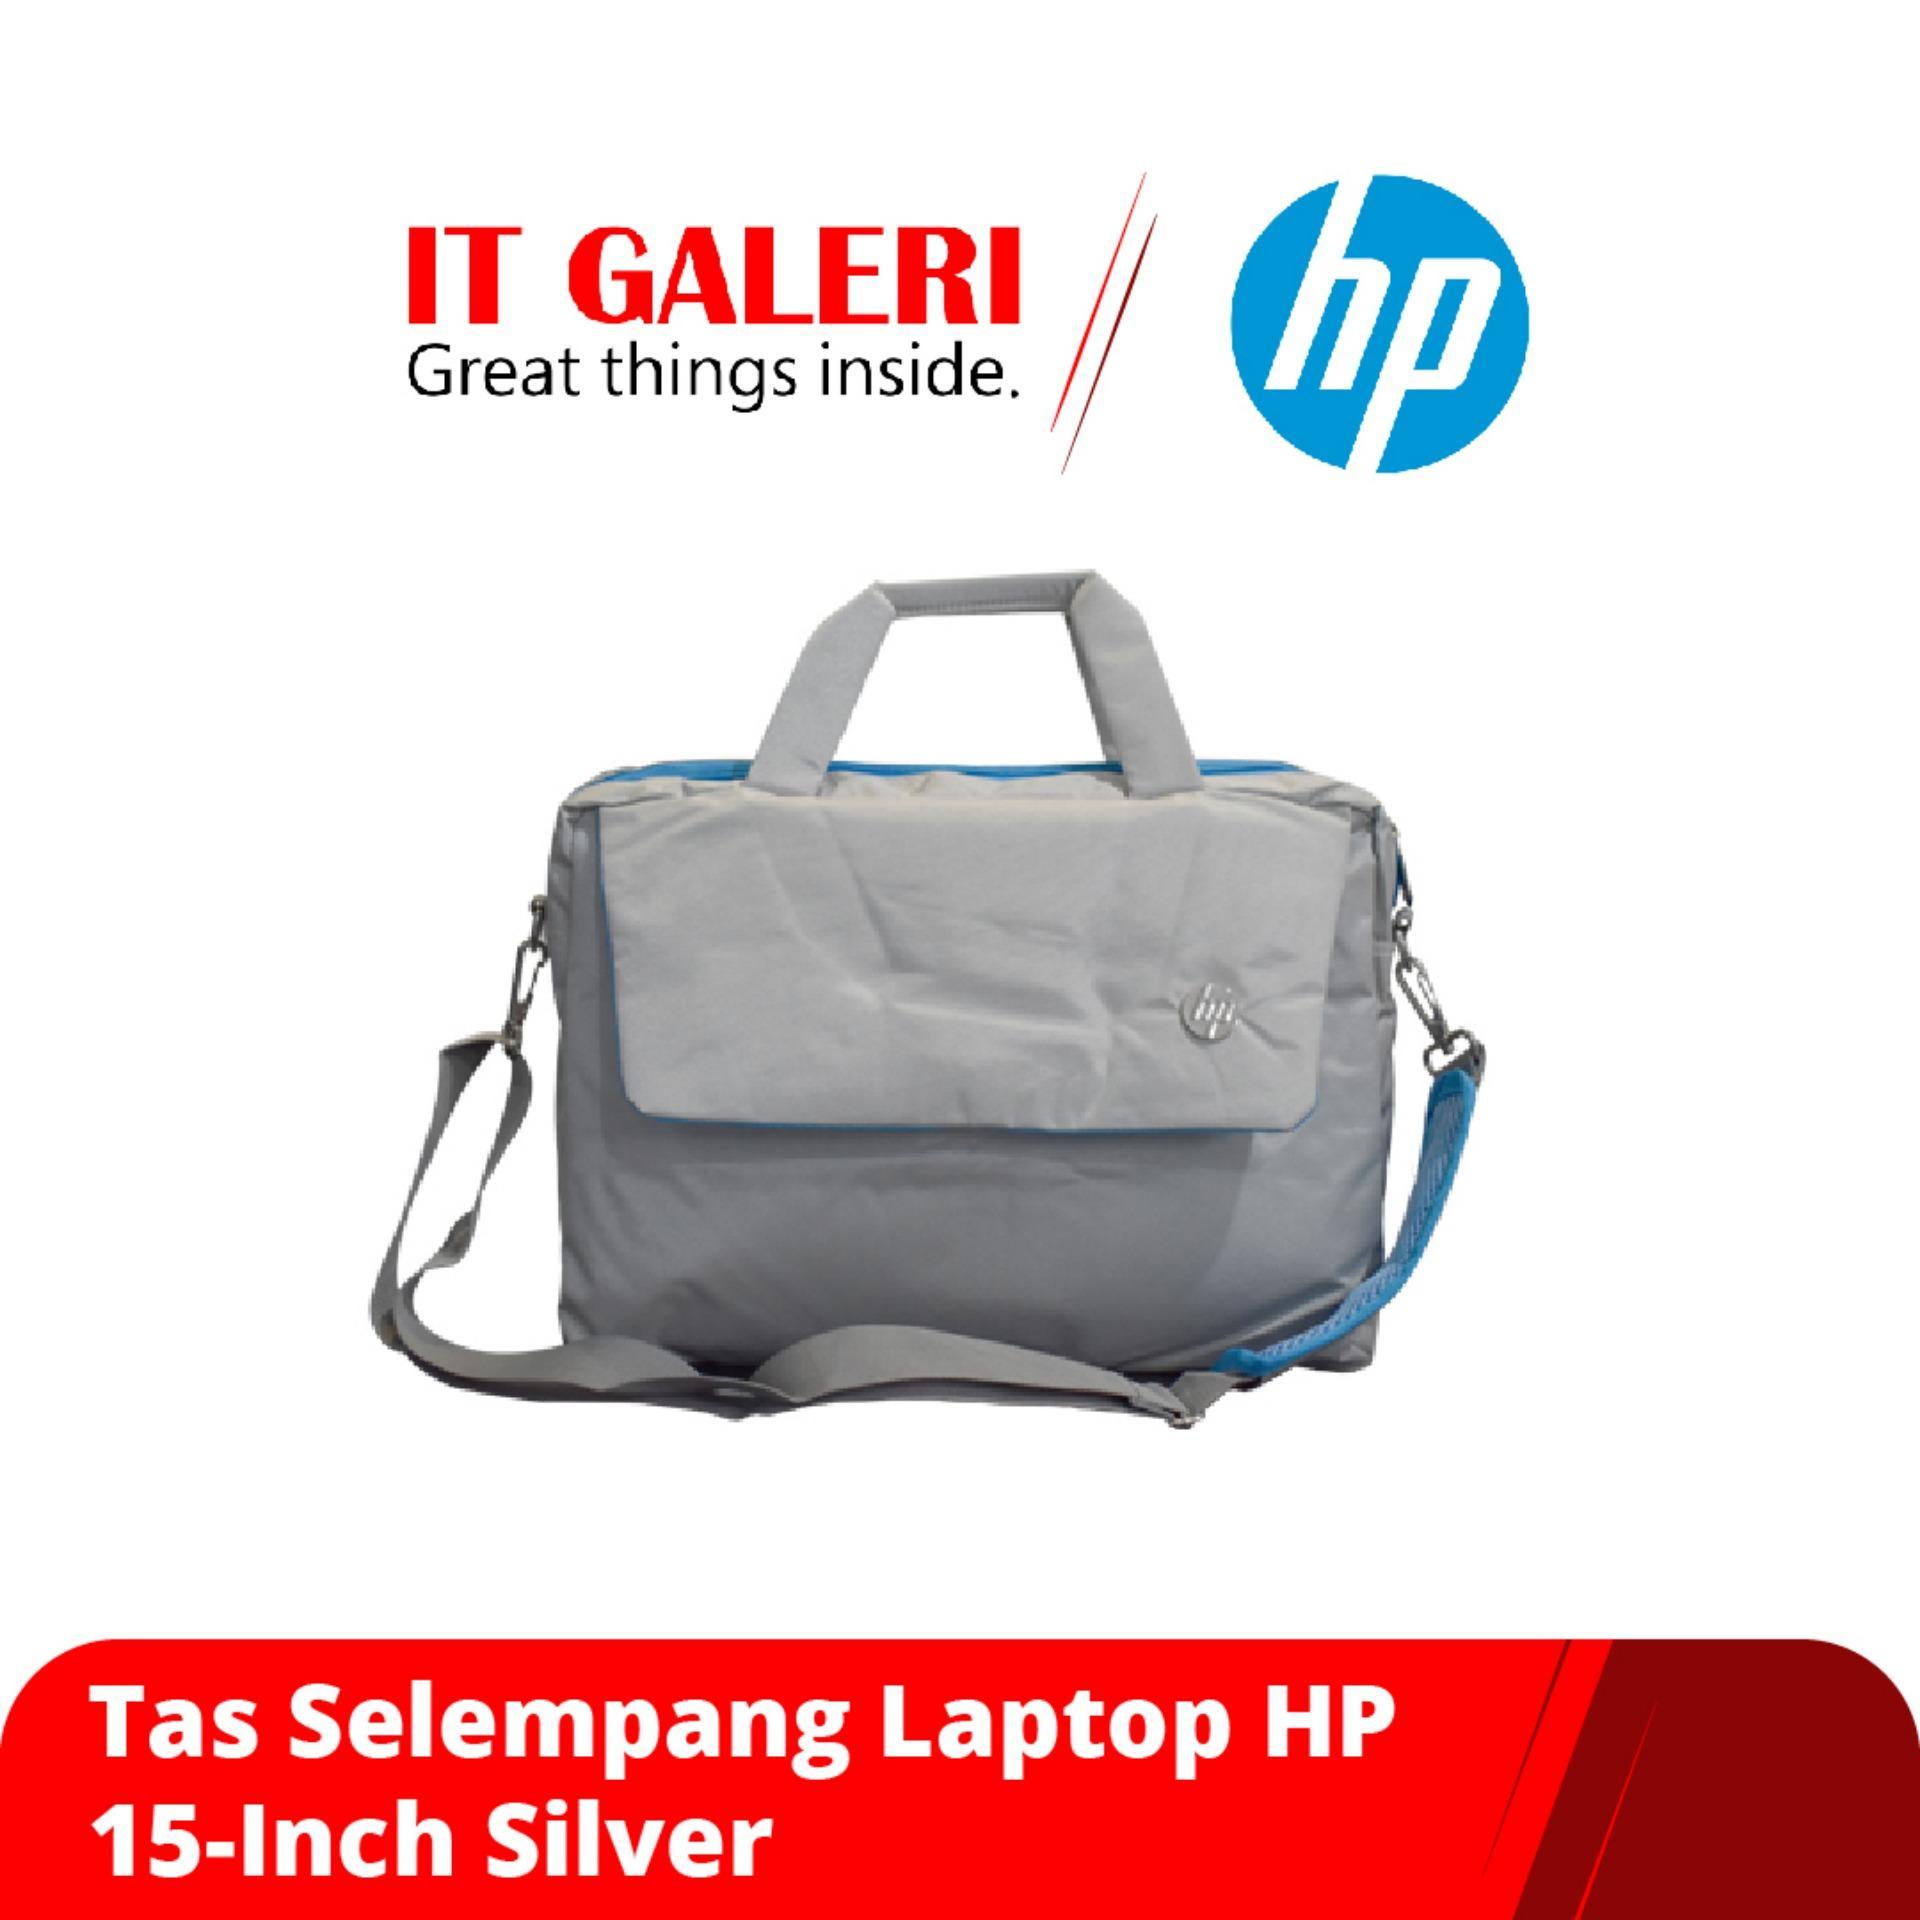 Tas Selempang Laptop HP 15-Inch Silver